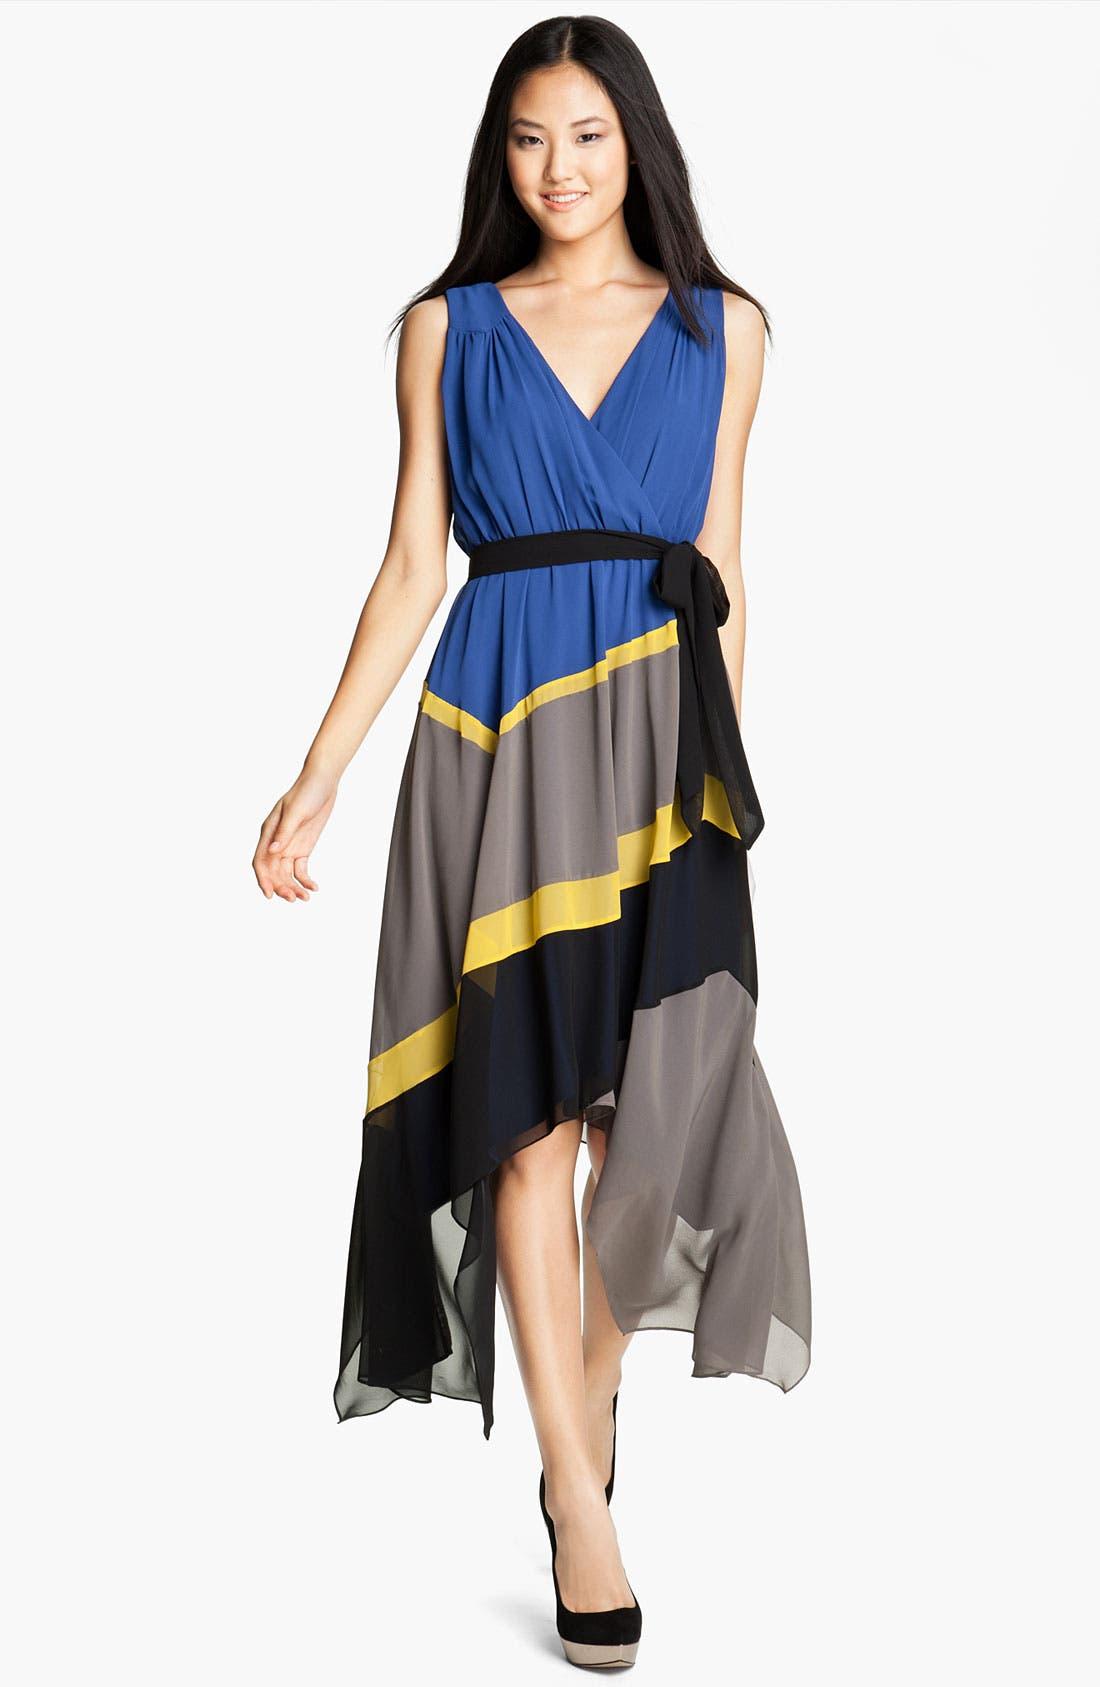 Alternate Image 1 Selected - Max & Cleo 'Jamie' Colorblock Chiffon Dress